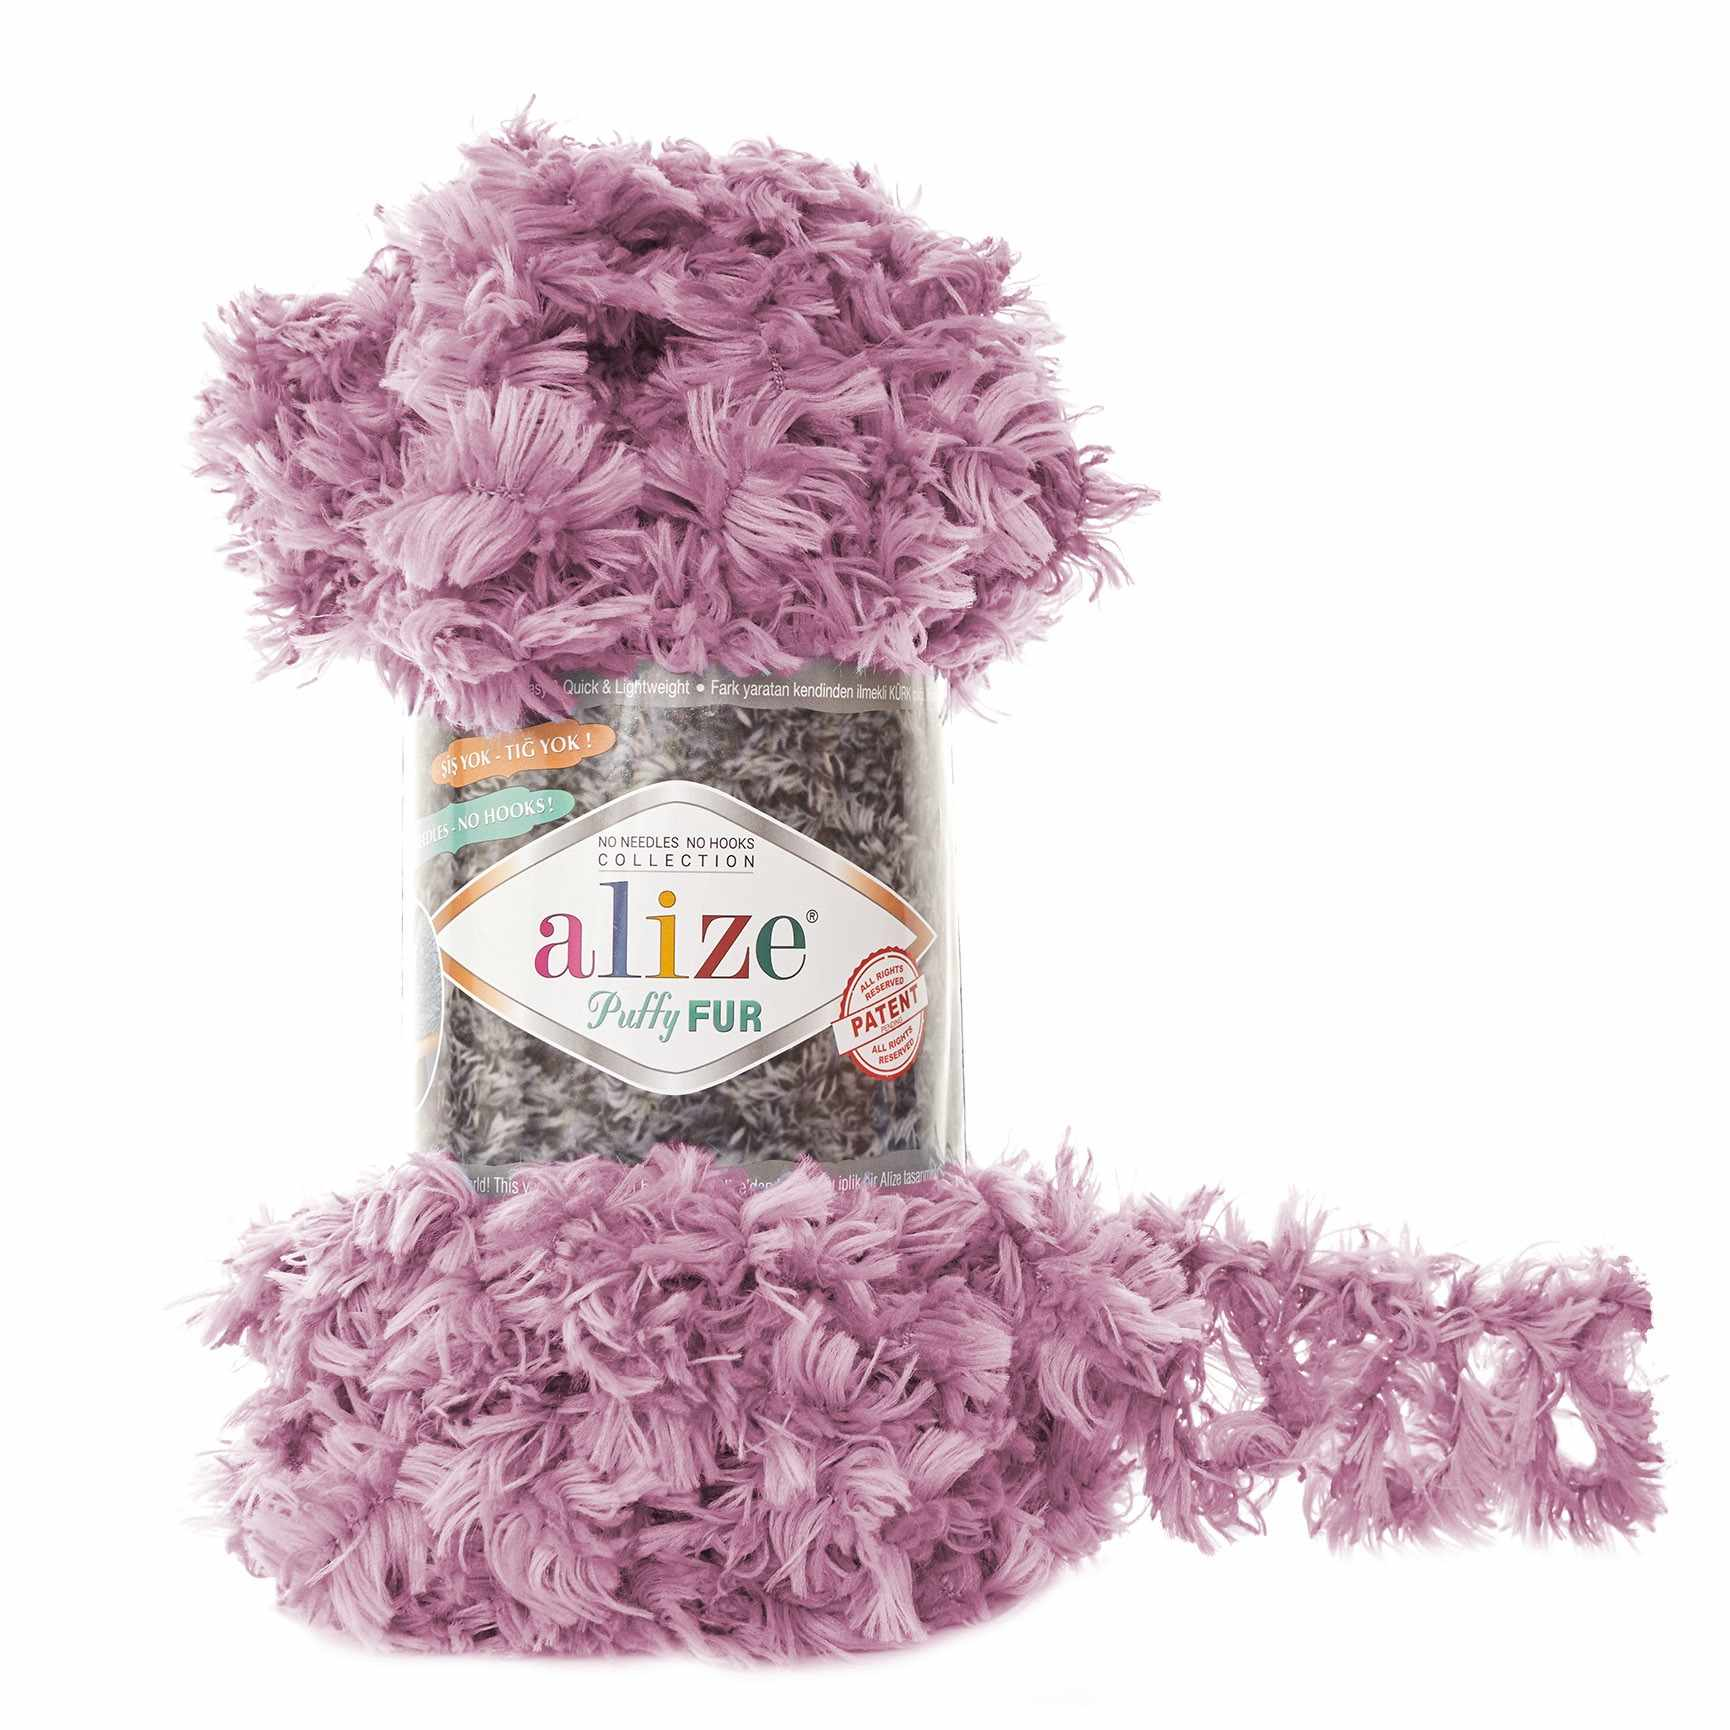 Пряжа Alize Puffy Fur Цвет.6103 Сирень